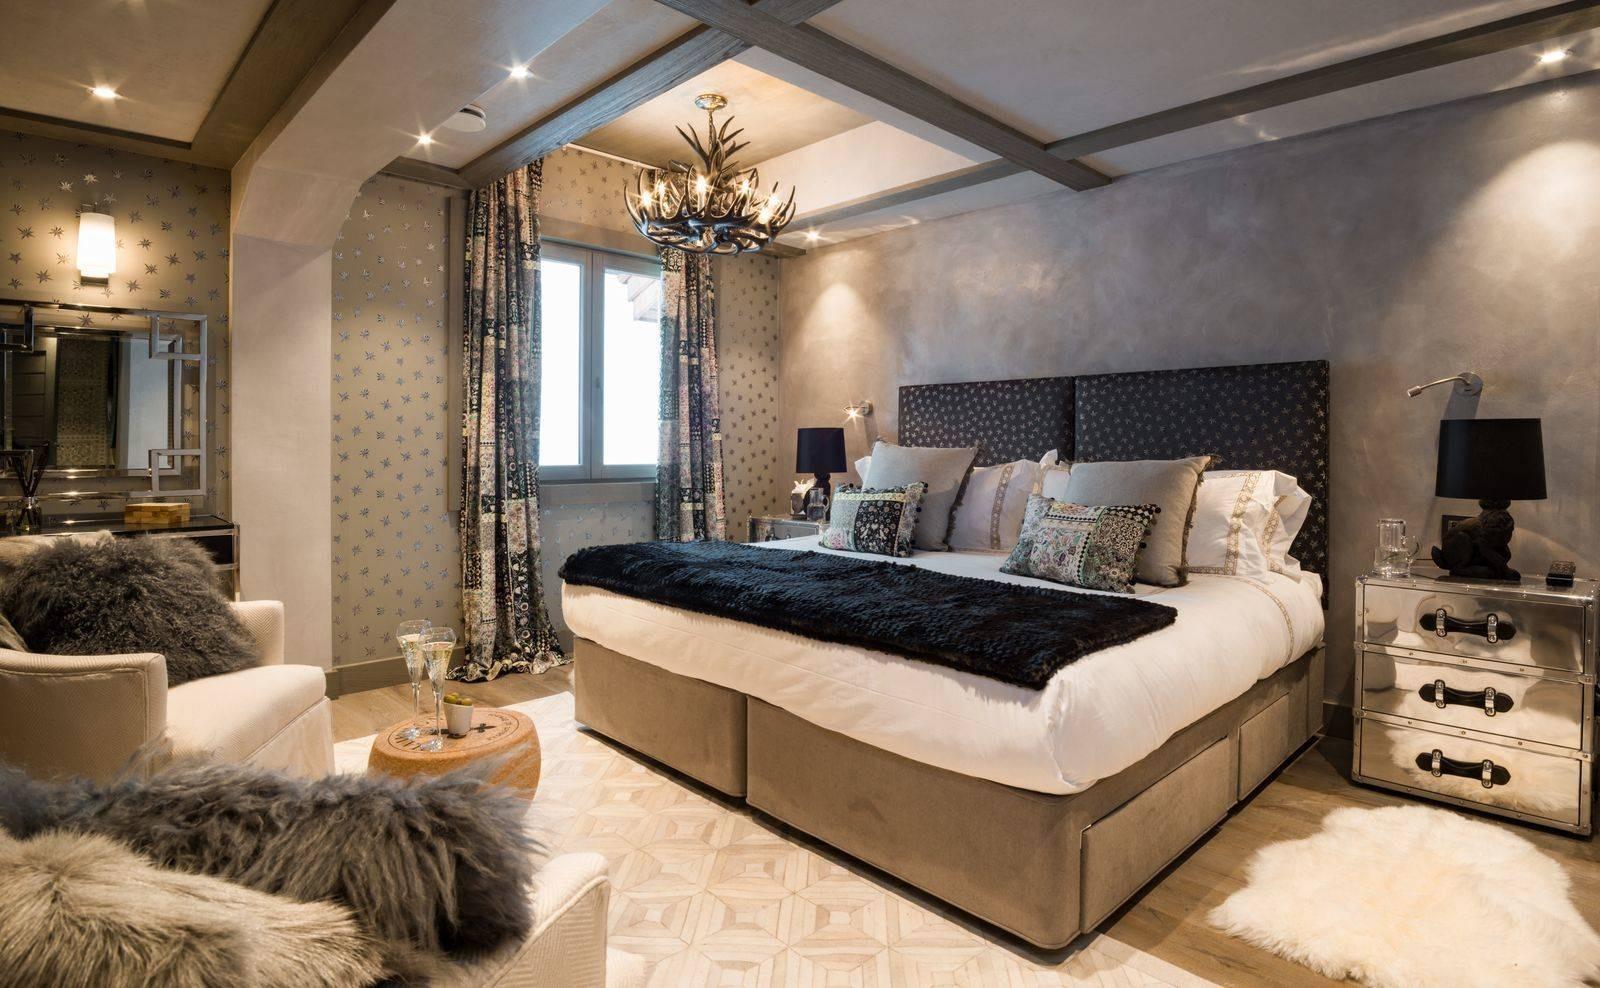 Courchevel 1850 Location Appartement Luxe Cetinape Chambre